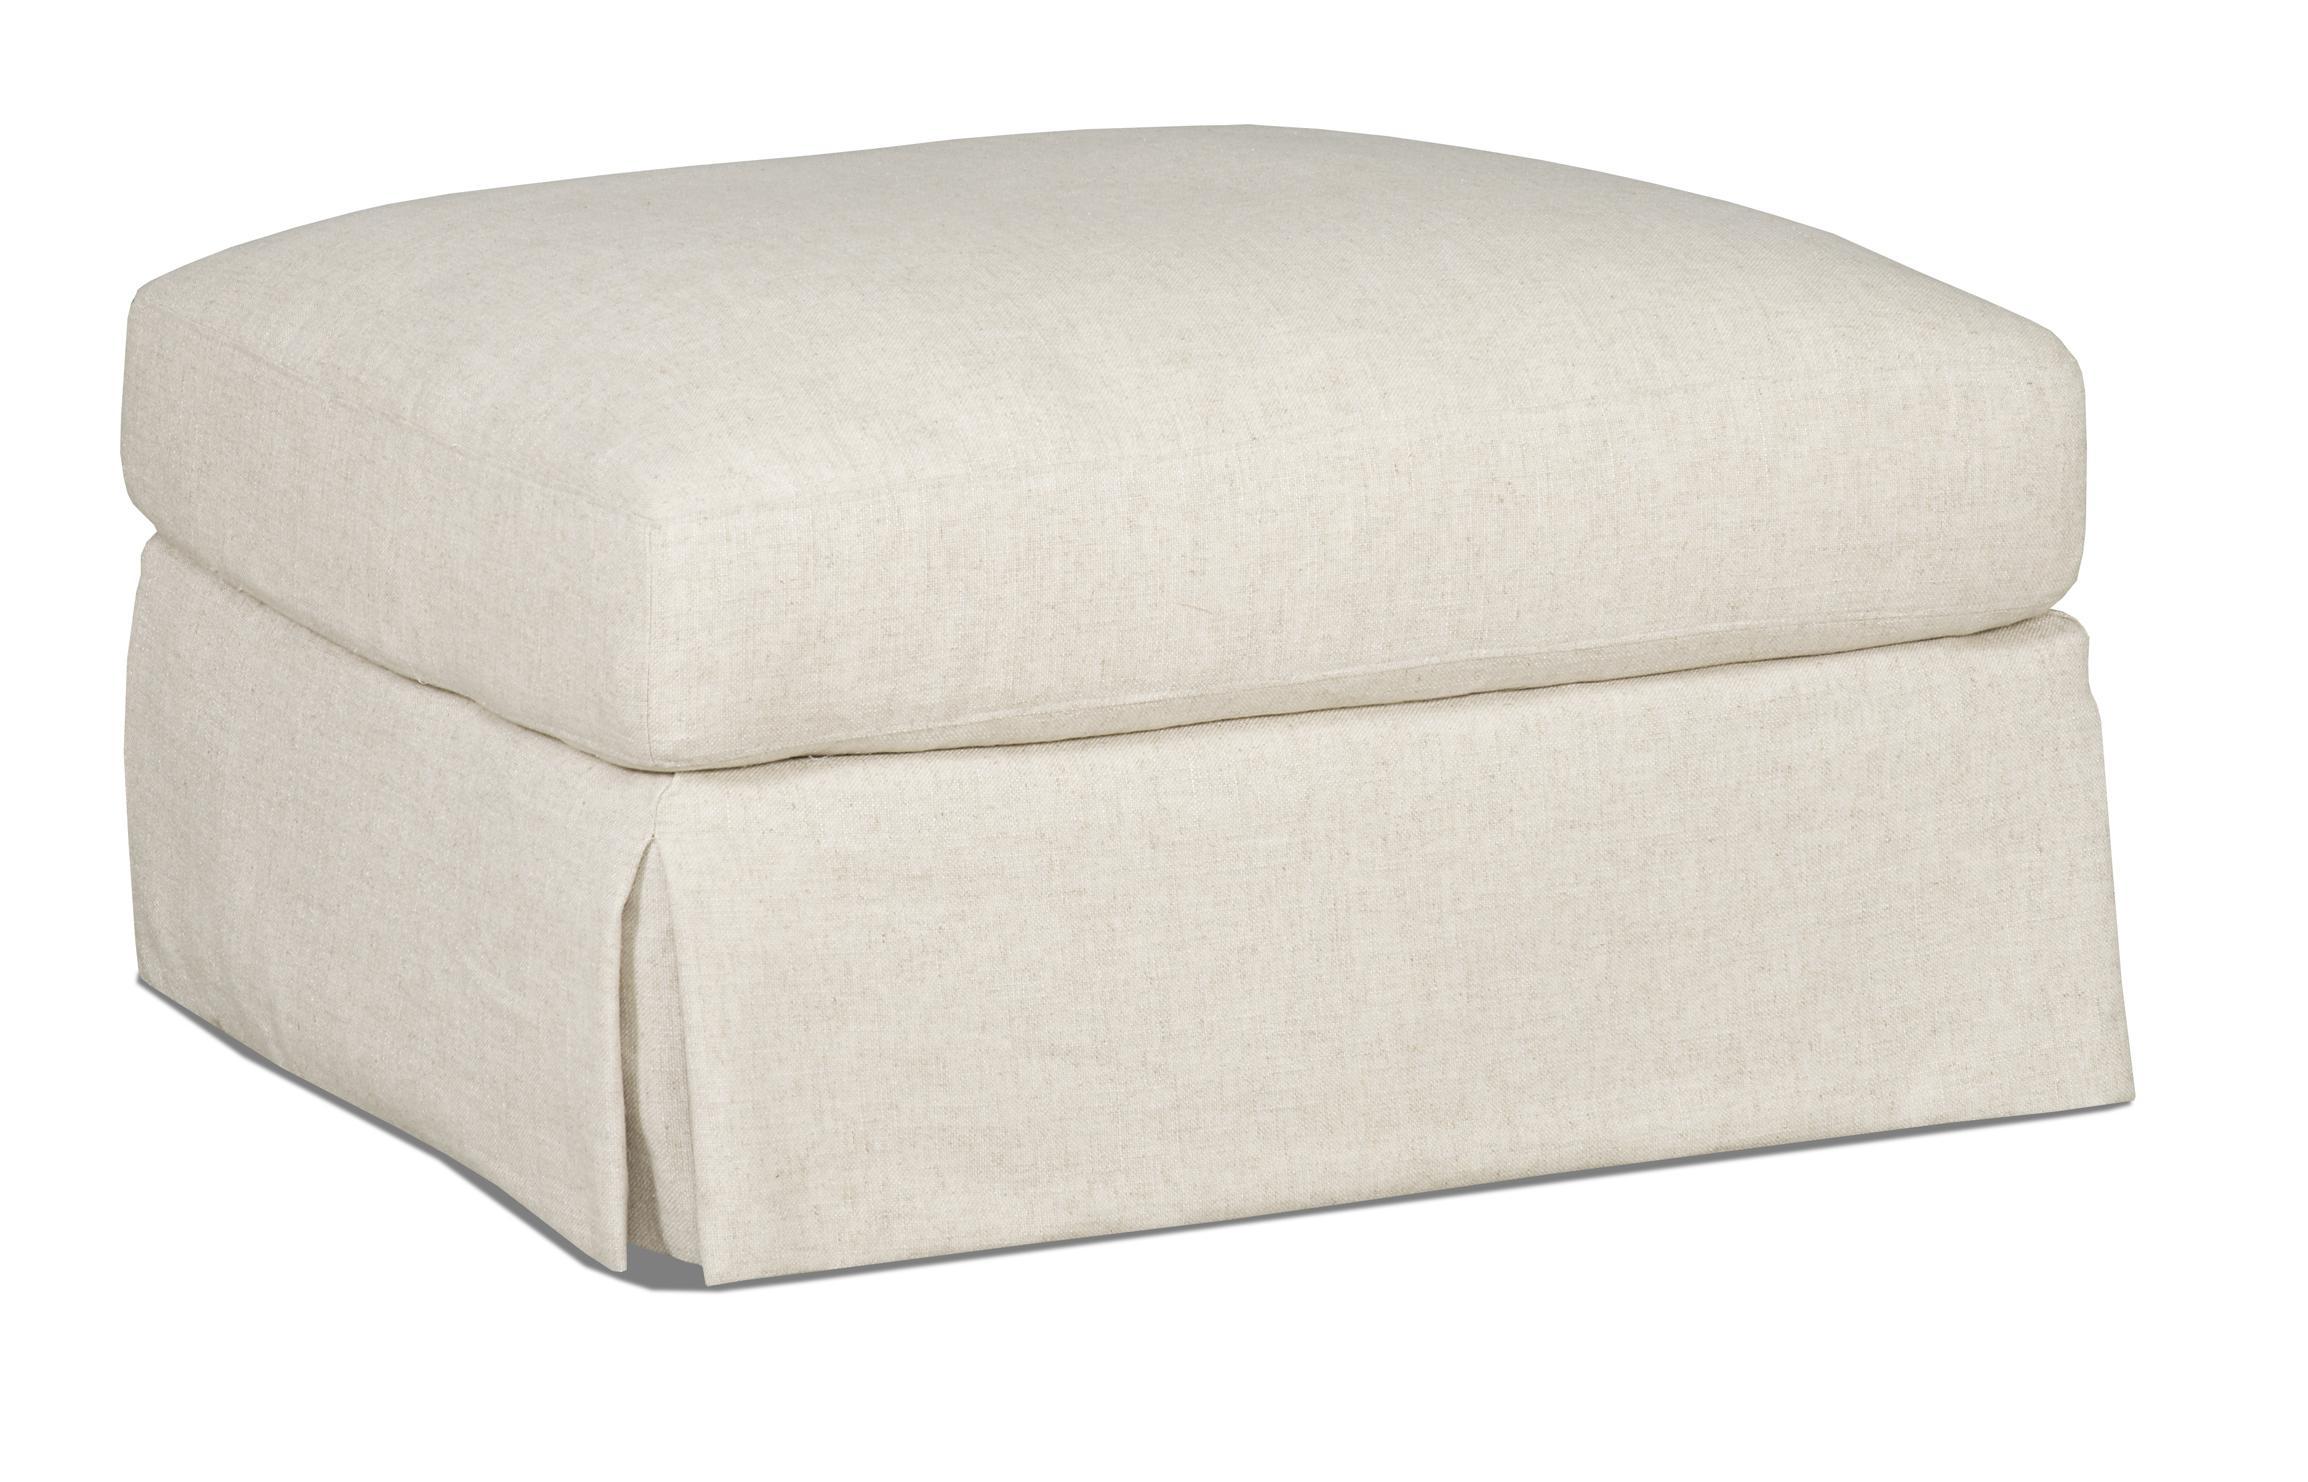 sam moore carson sofa sofas sale traditional skirted ottoman belfort